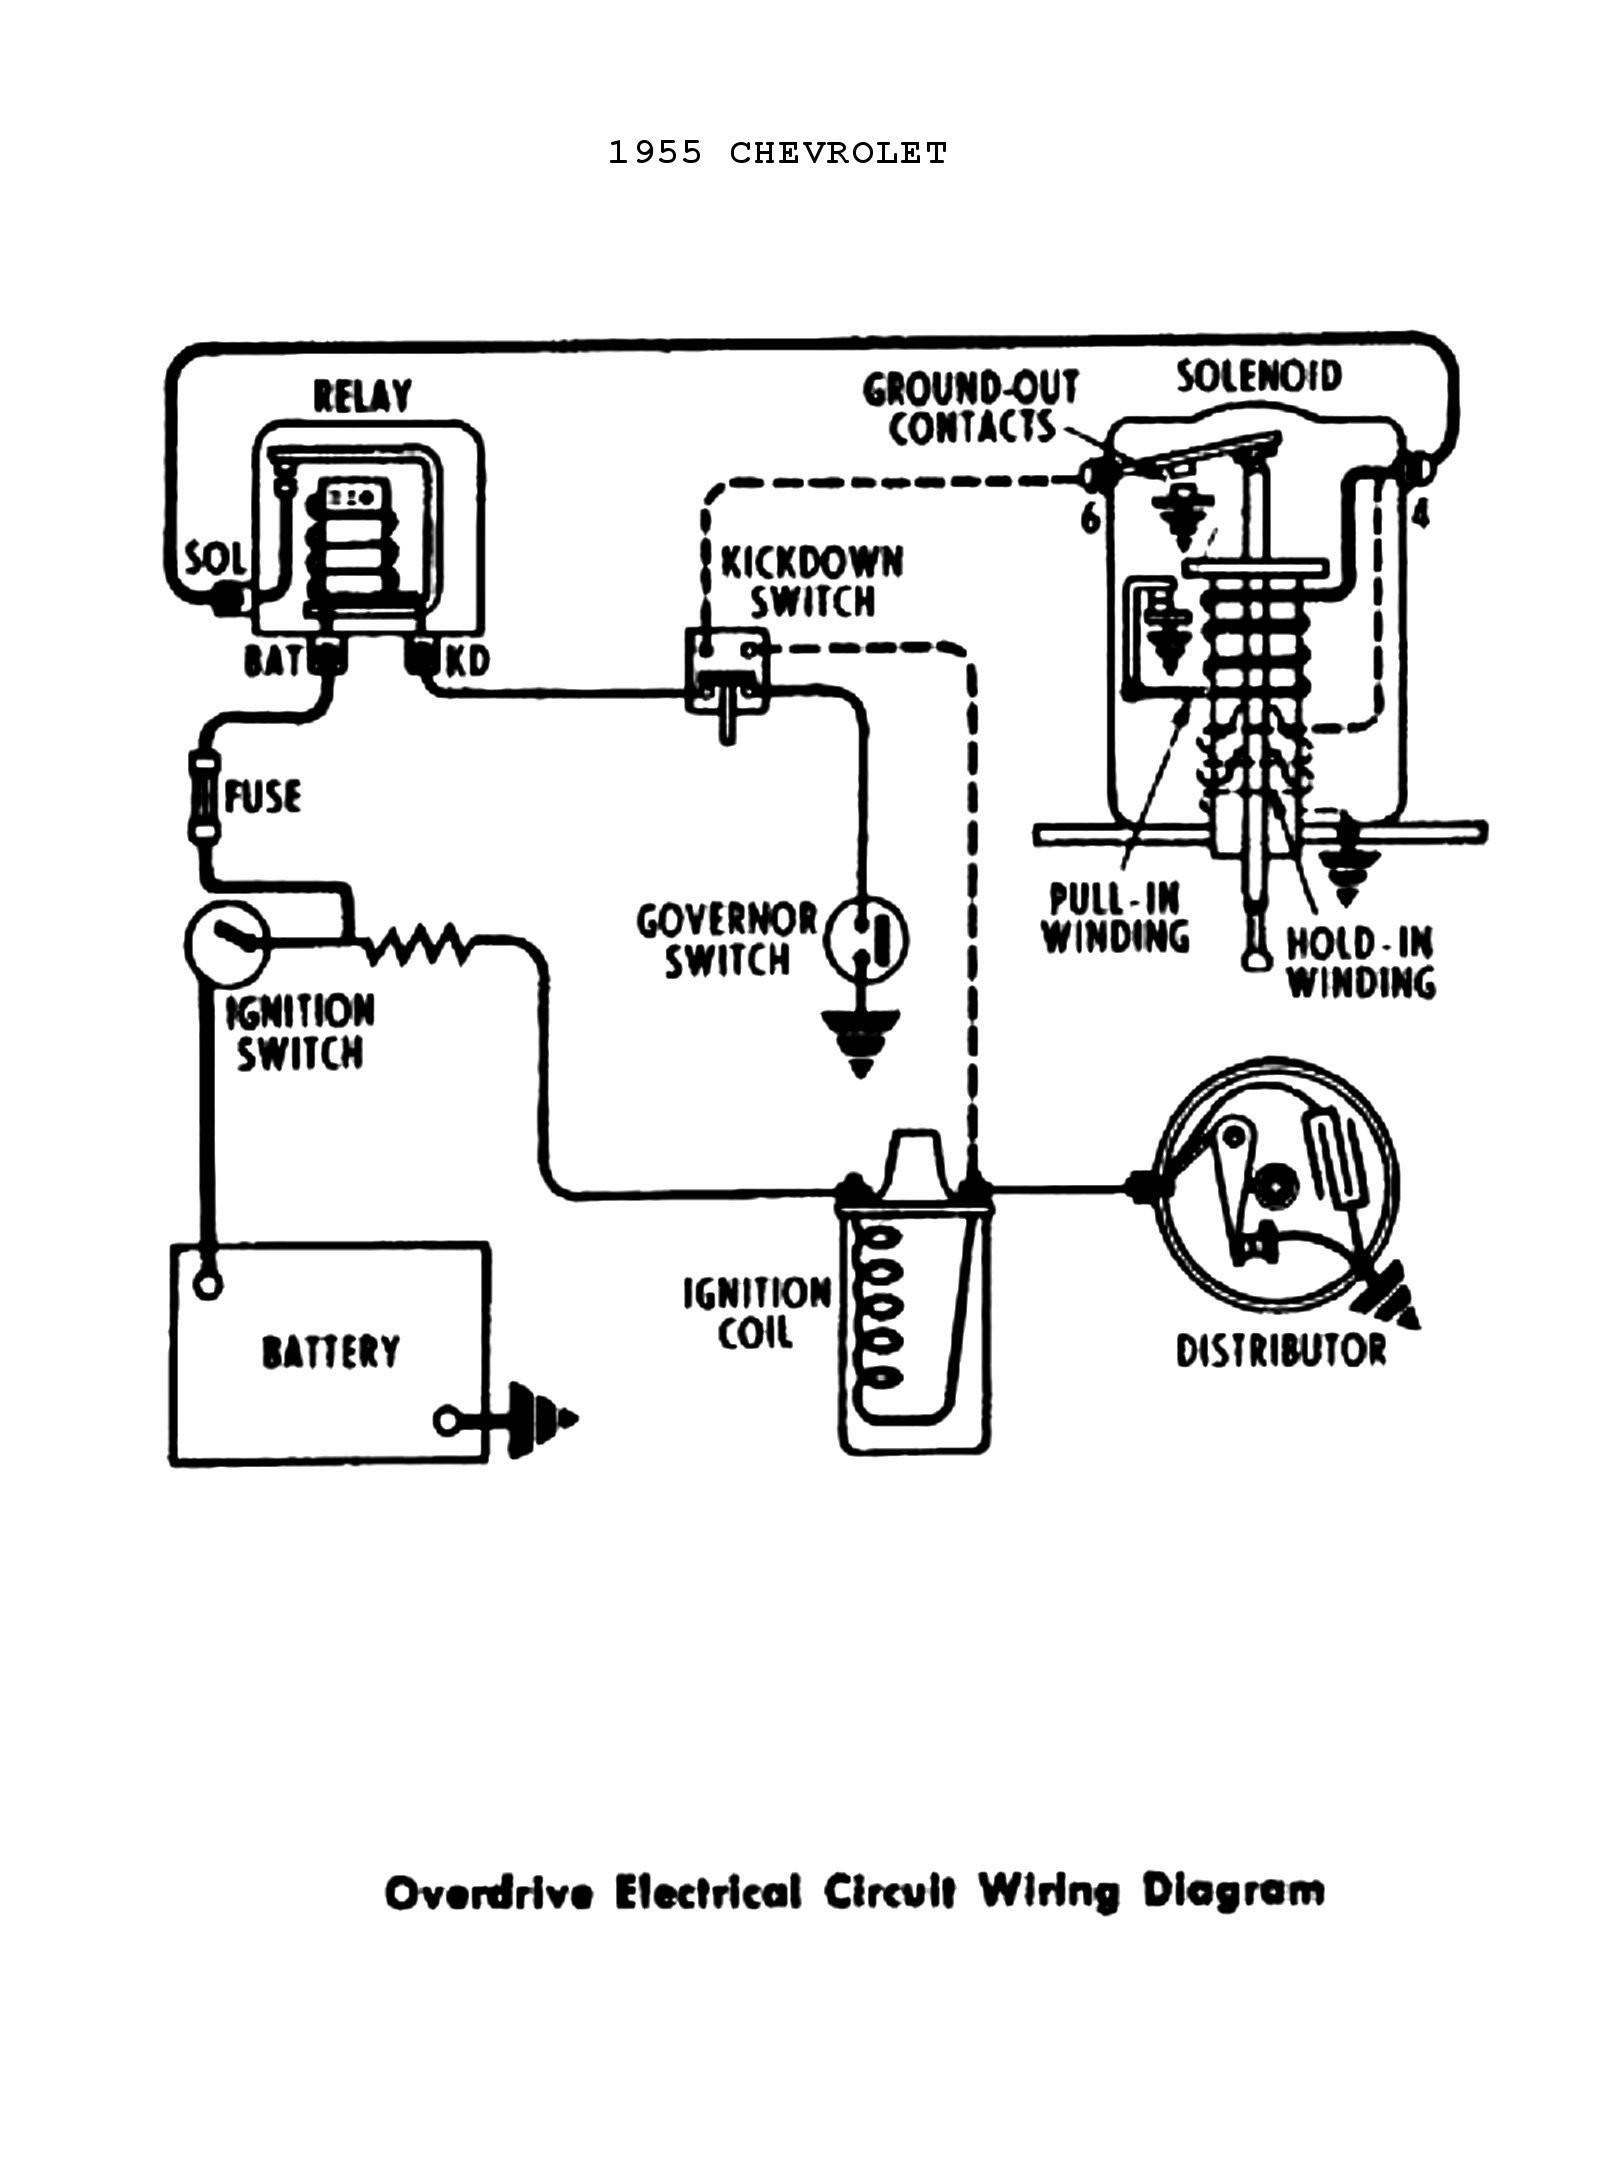 Relay Wiring Diagram for Starter Fresh Wiring Diagram Starter solenoid Best Chevy Ignition Coil Wiring